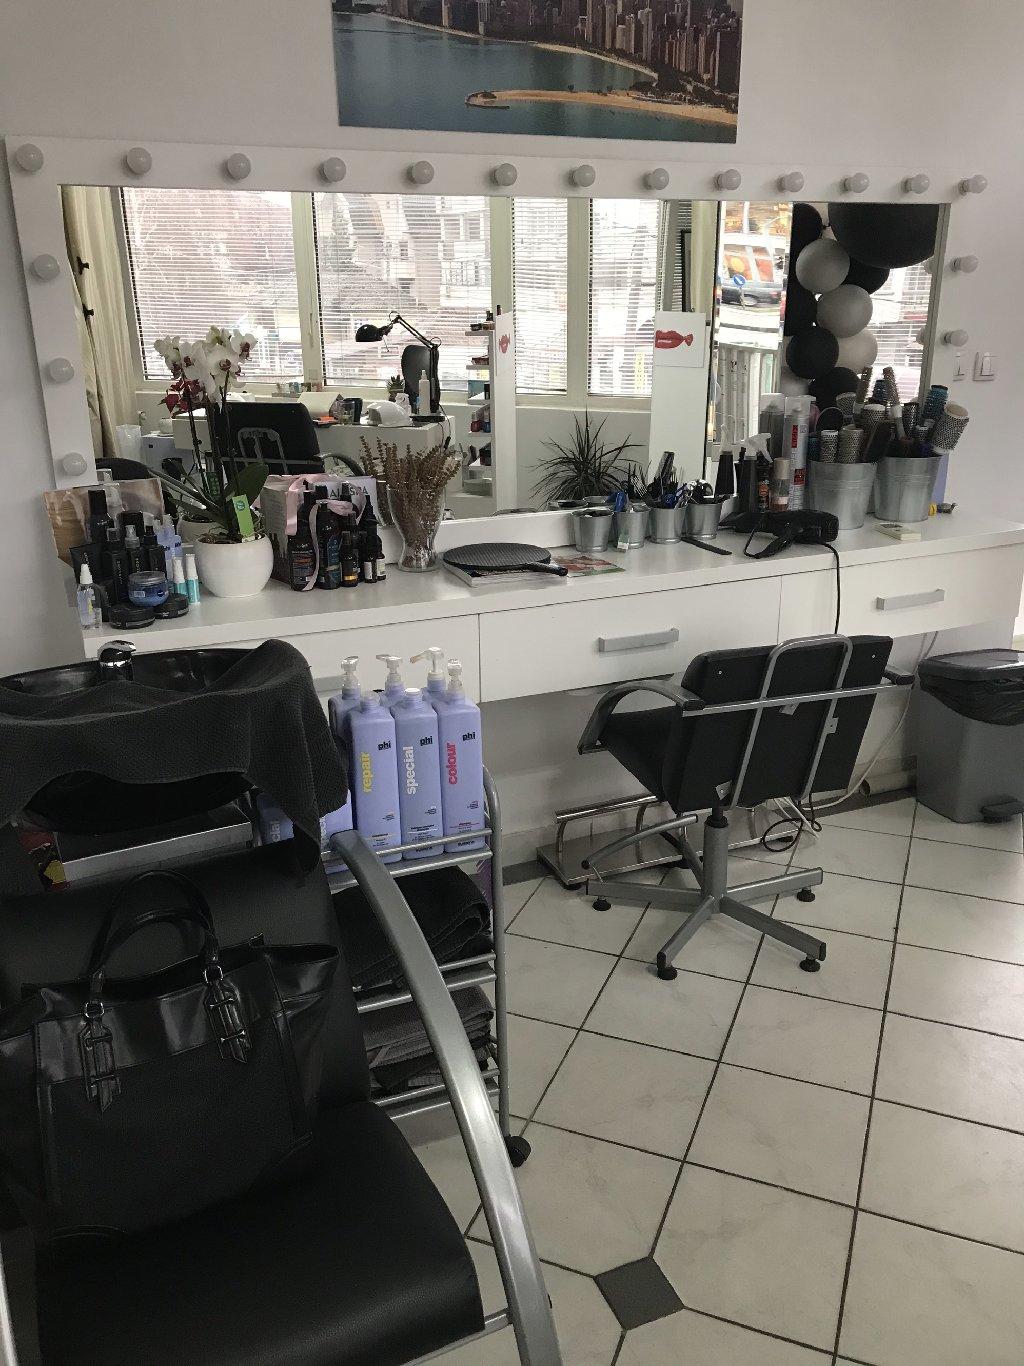 Izdajem kompletno namesten frizerski salon,sa svom opremom,farbama,blansevima,negom,cetkama,bukvalno svee,samo da dodjete i krenete da radite